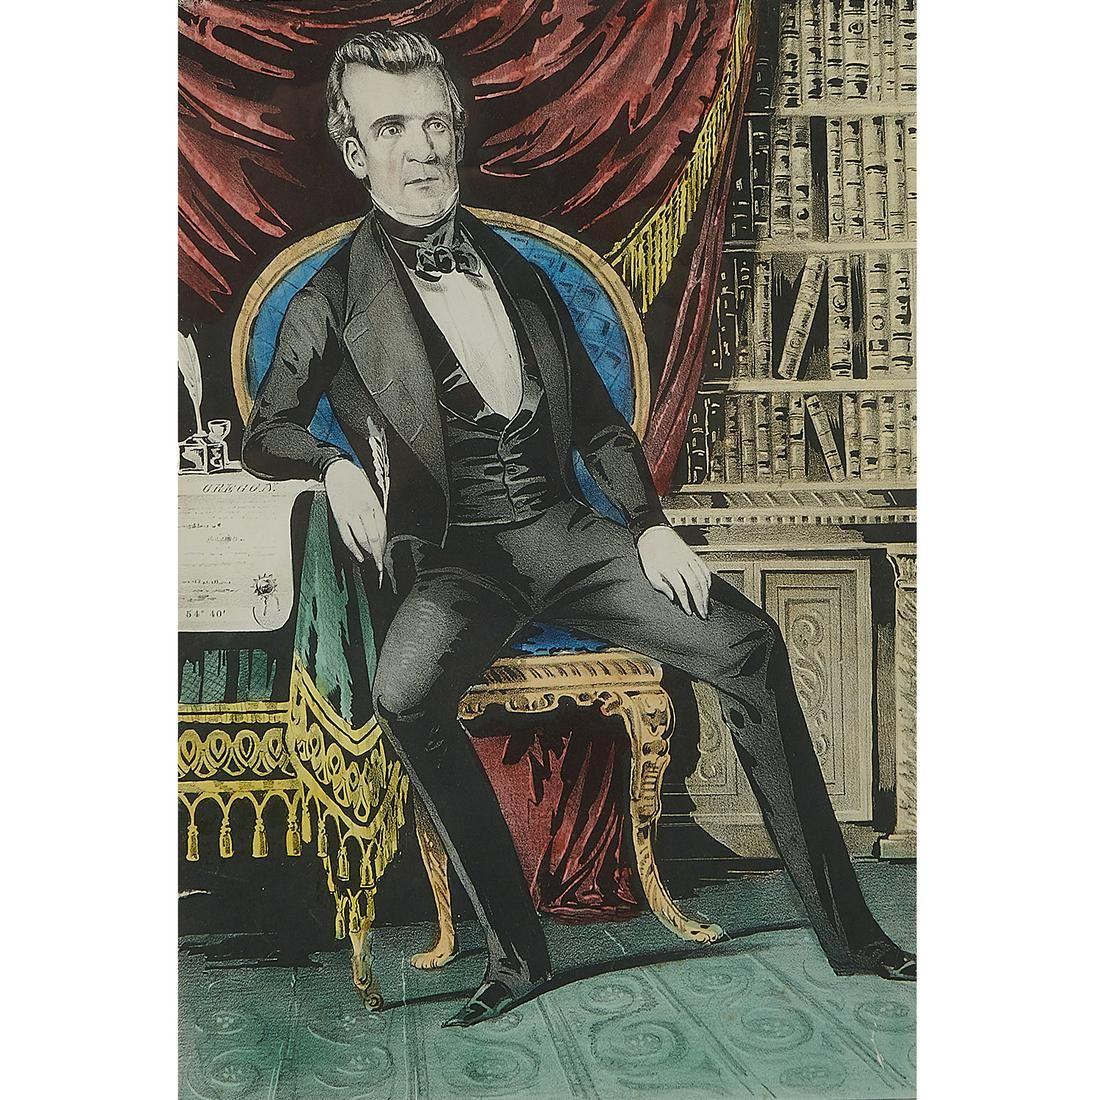 Sarony & Major, James K. Polk. Freedom's Champion